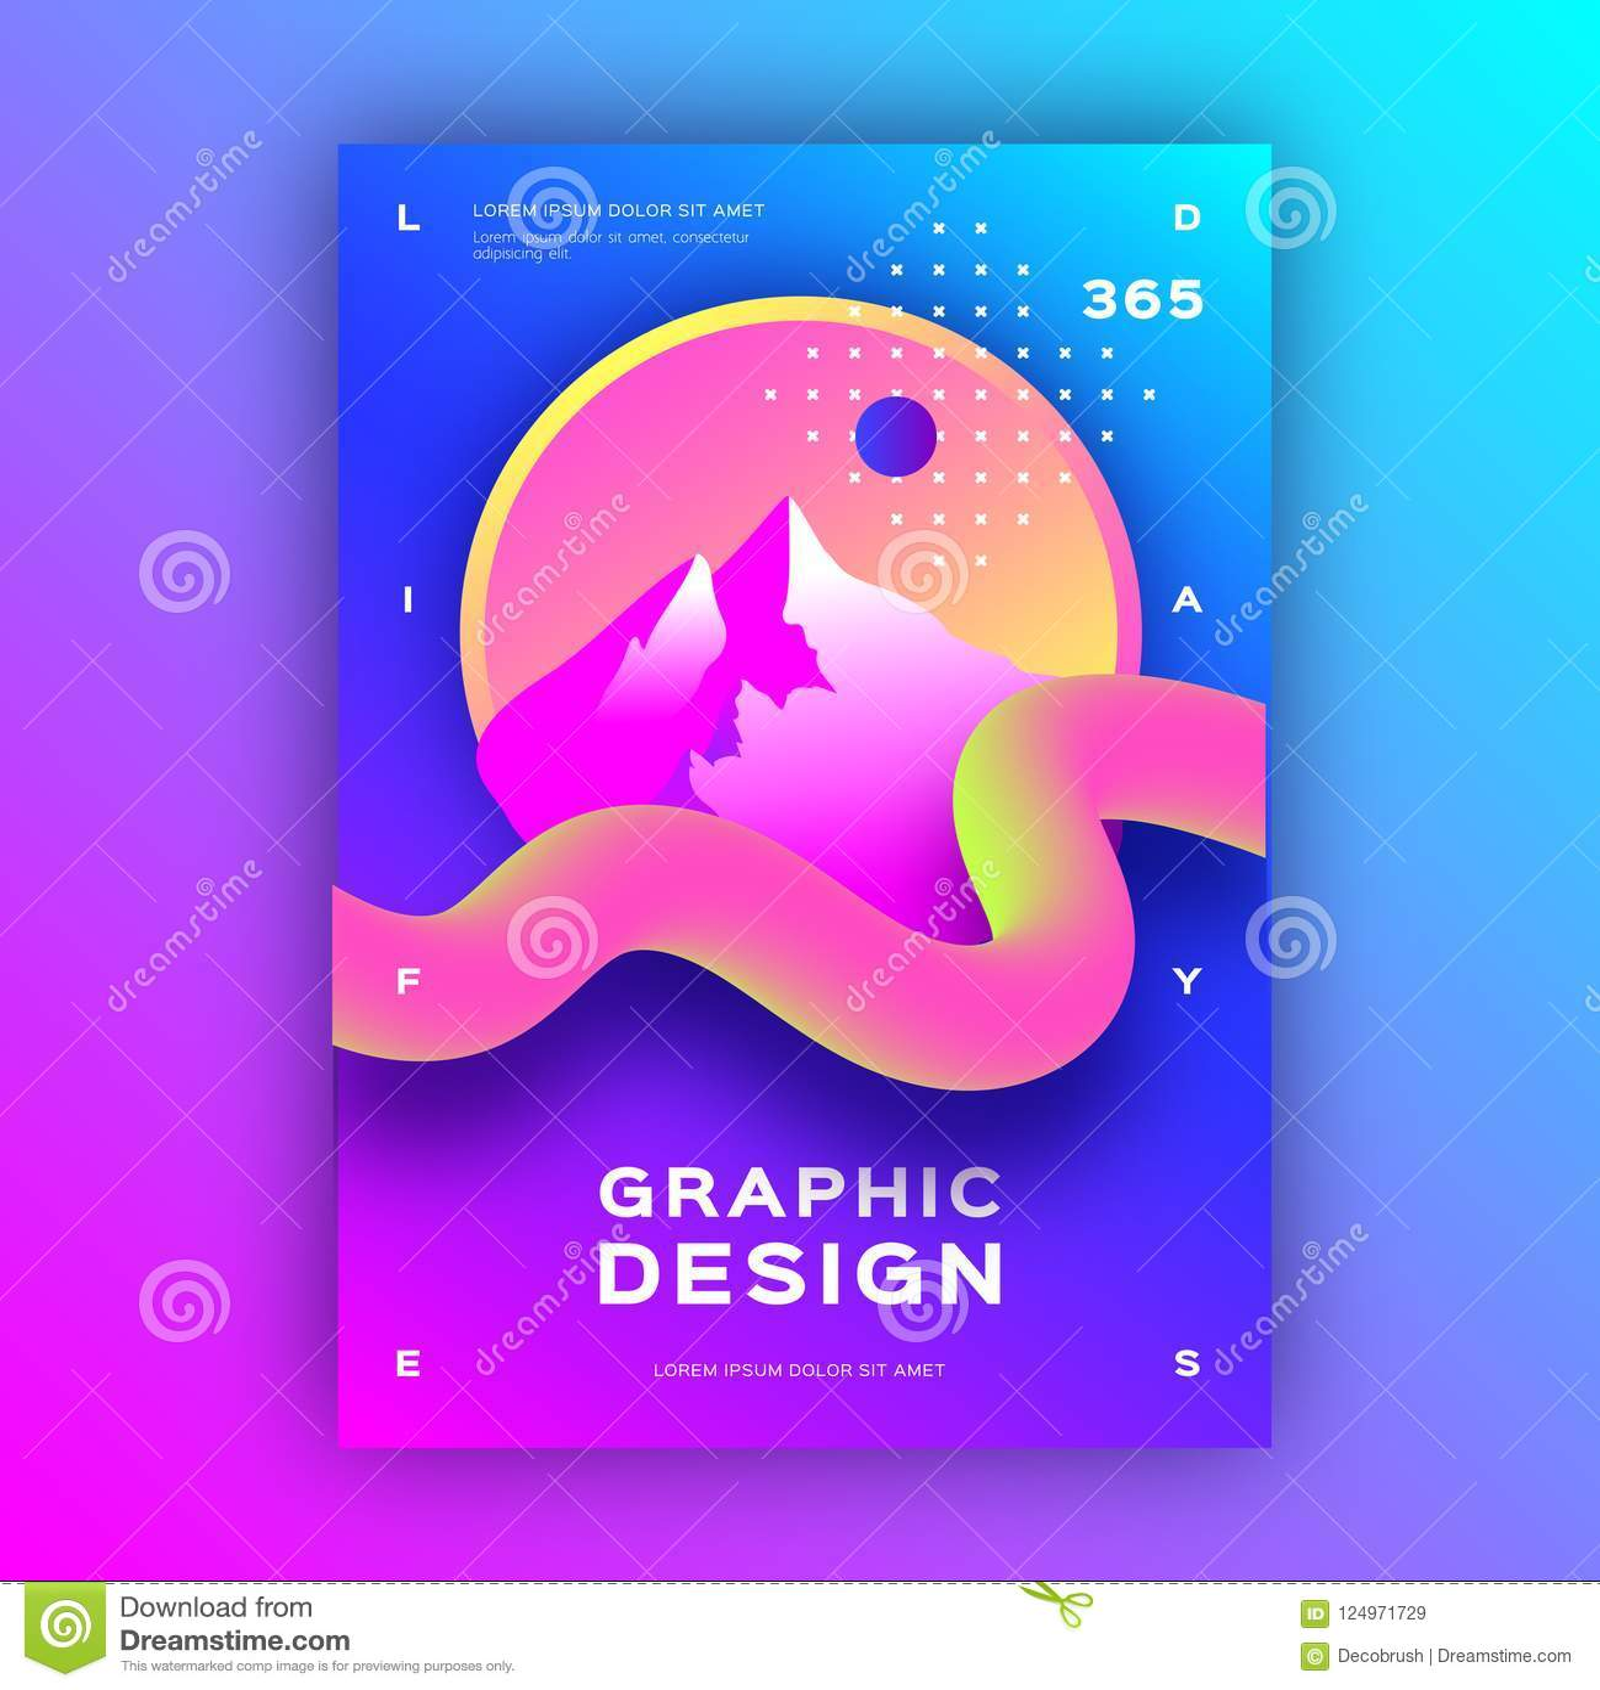 O fundo abstrato geométrico, fundo líquido, líquido do inclinação dá forma Tamanho na moda do cartaz A4 do projeto gráfico, vetor